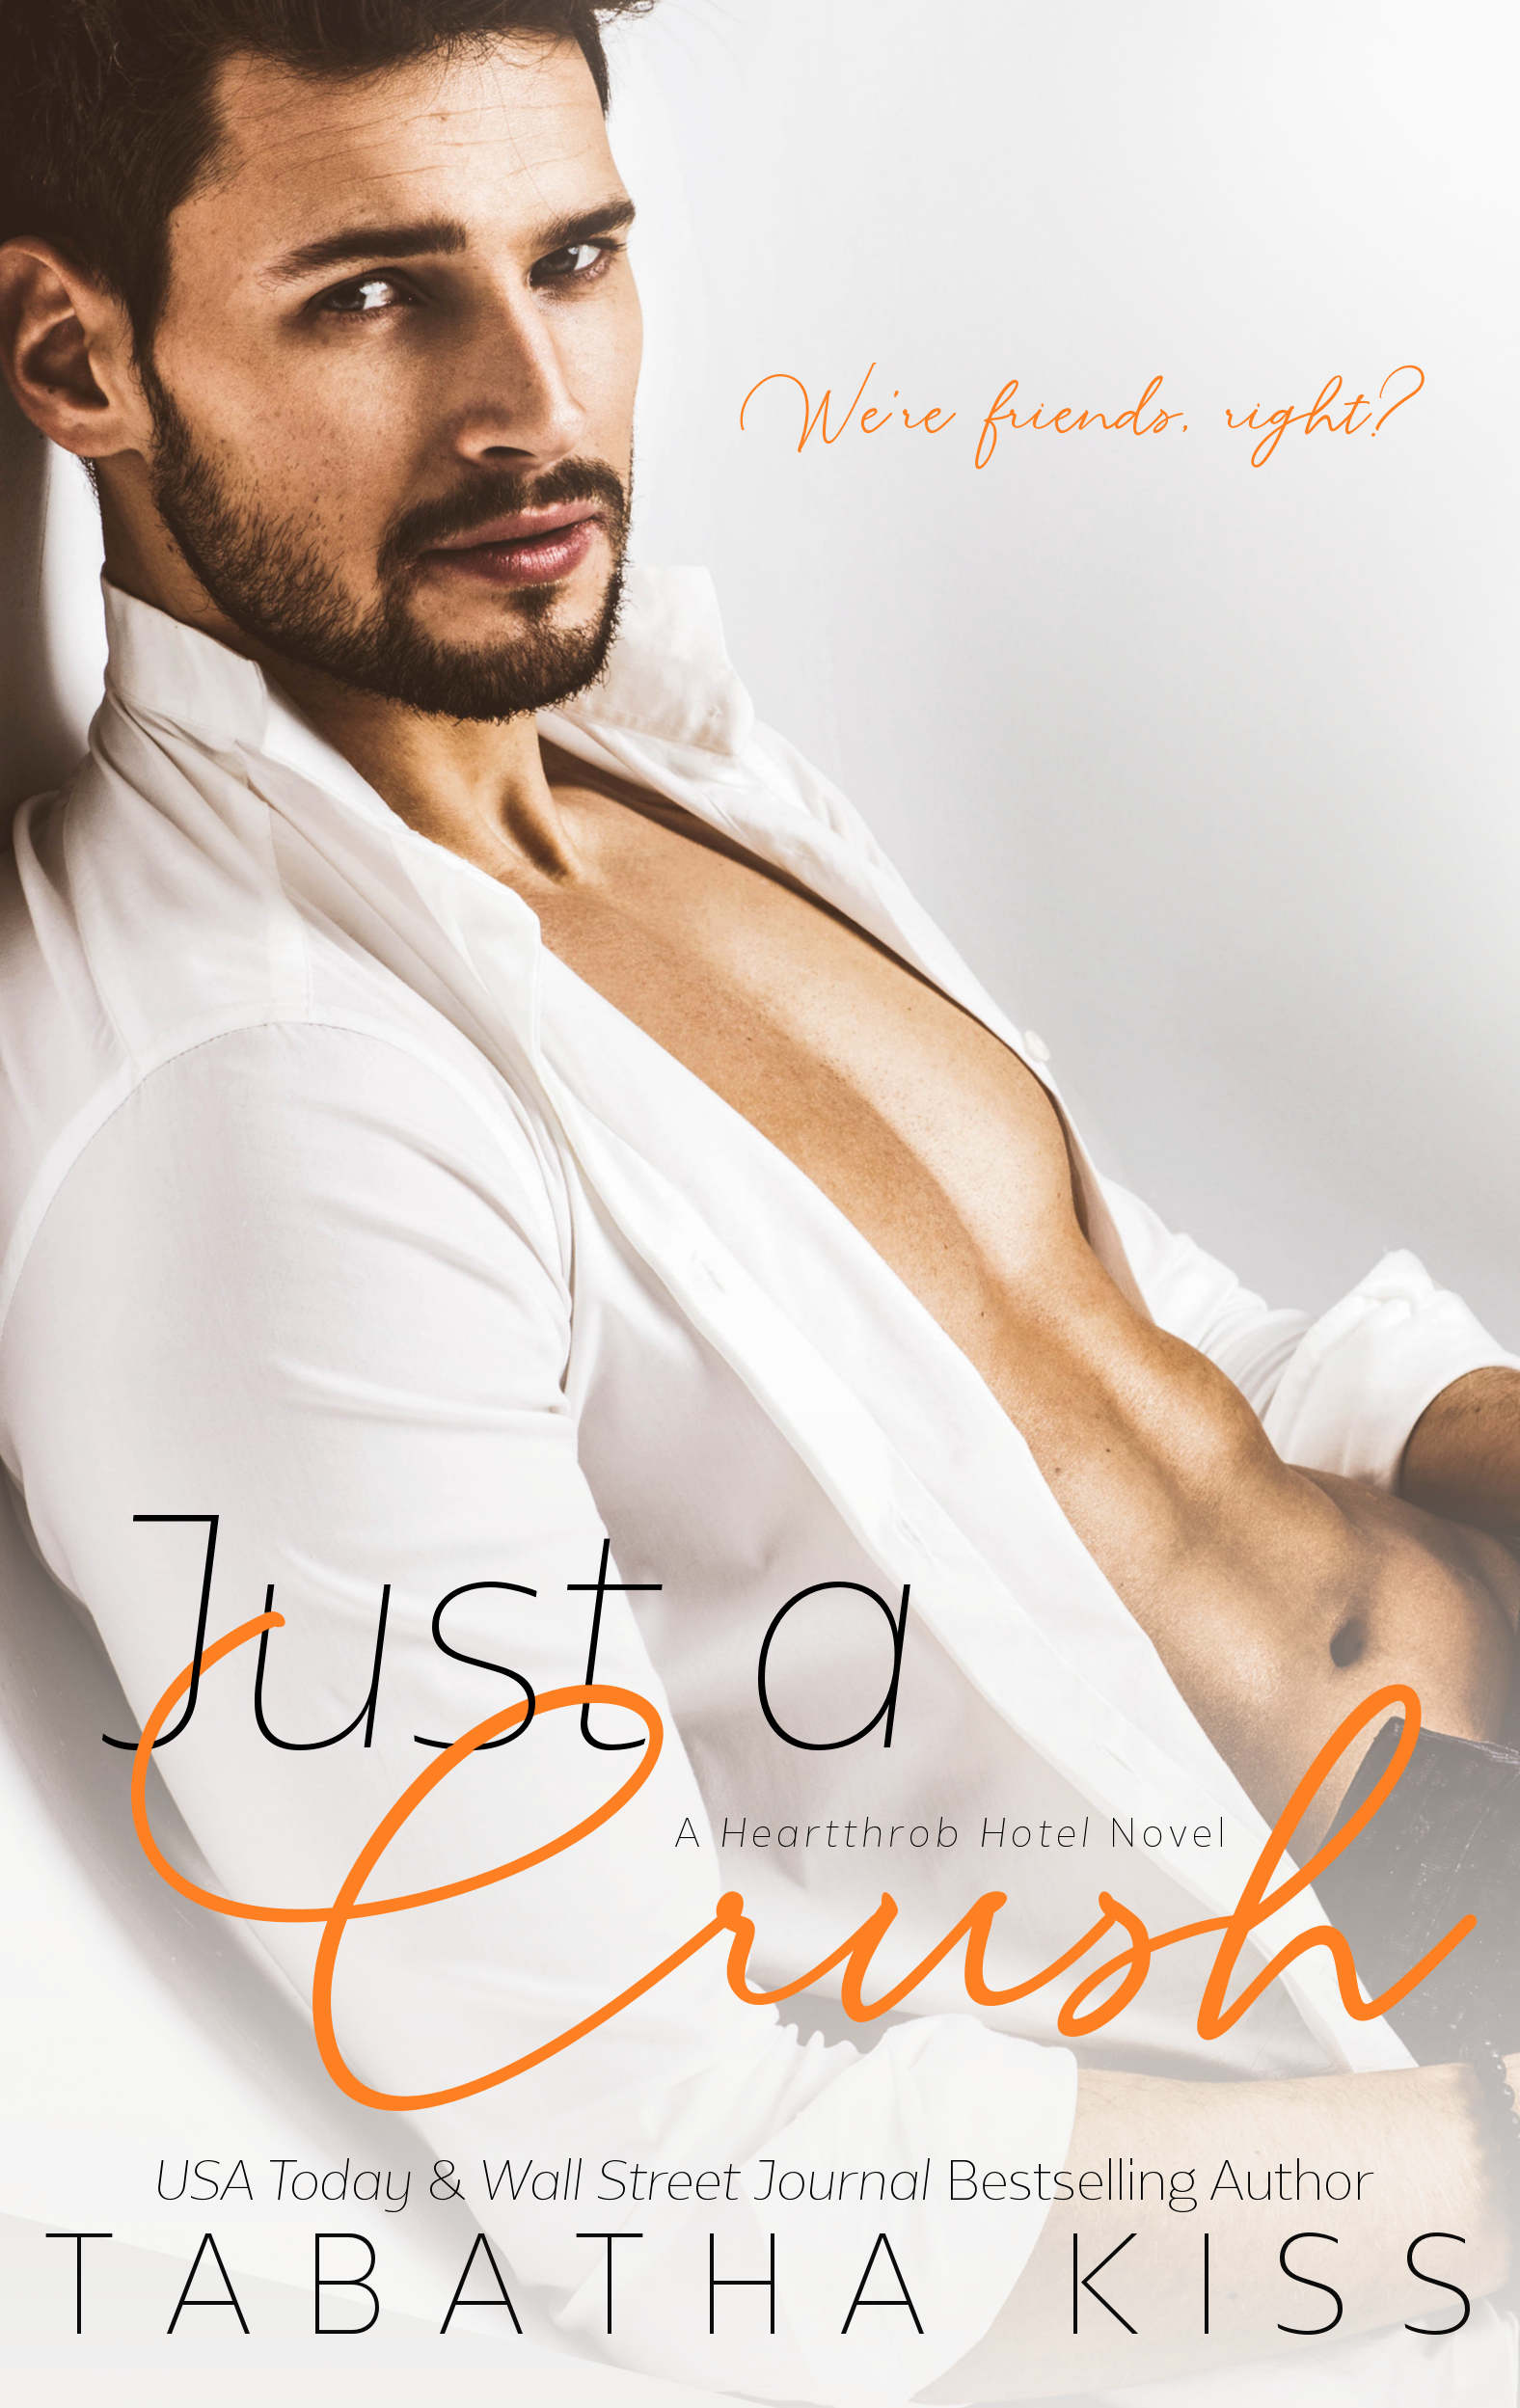 cover-justacrush